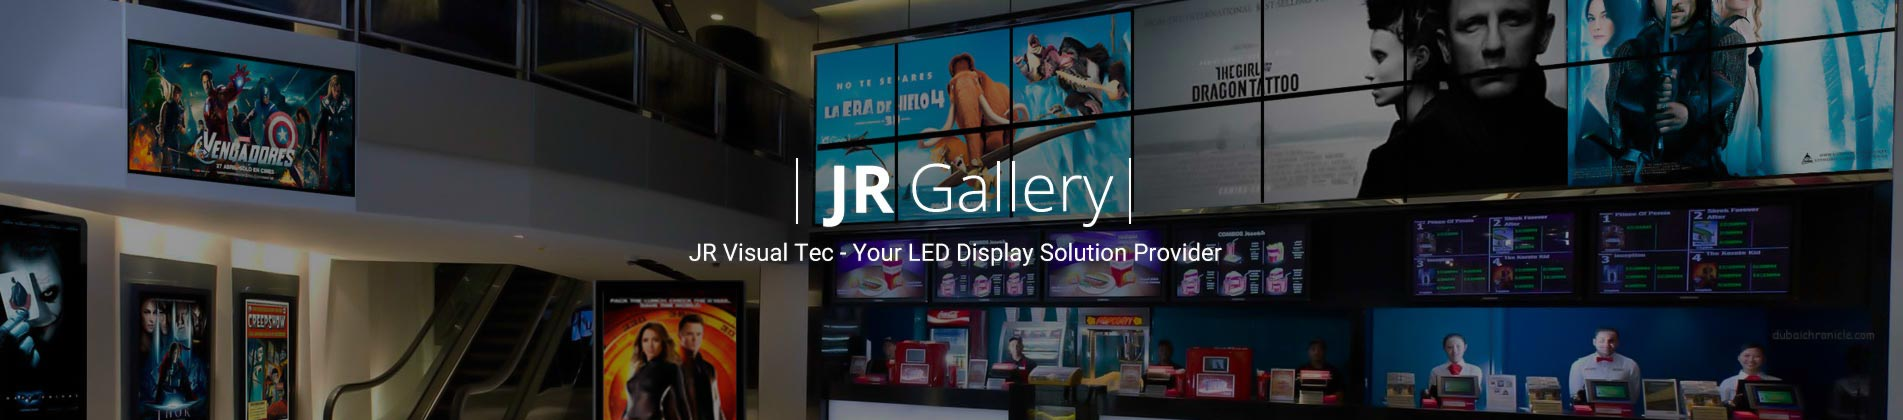 jr gallery